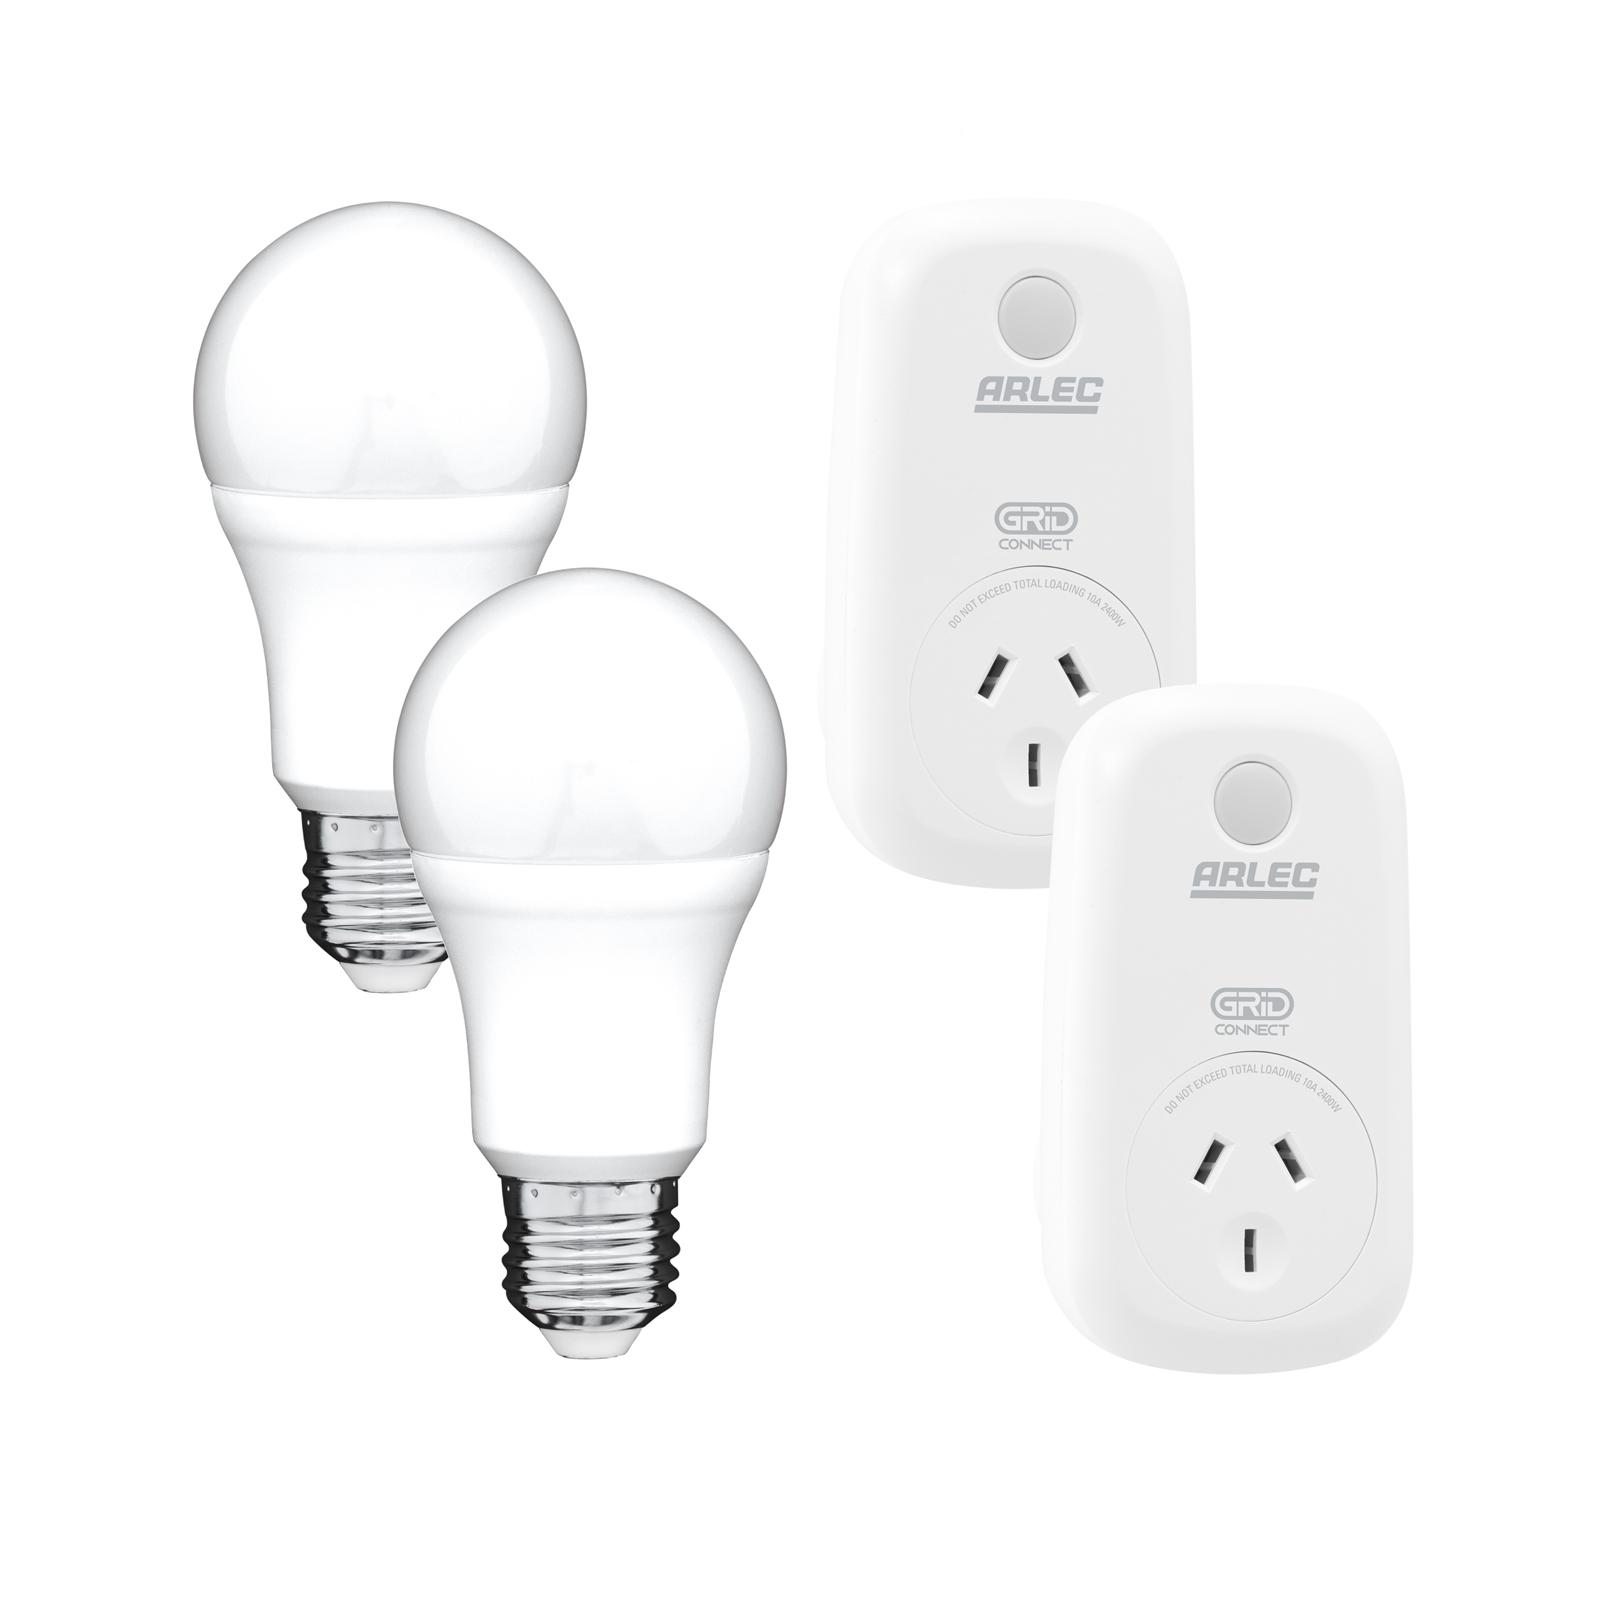 Arlec Smart Starter Kit With Grid Connect - 2x Smart A60 ES LED Globes And 2x Smart Plug In Sockets